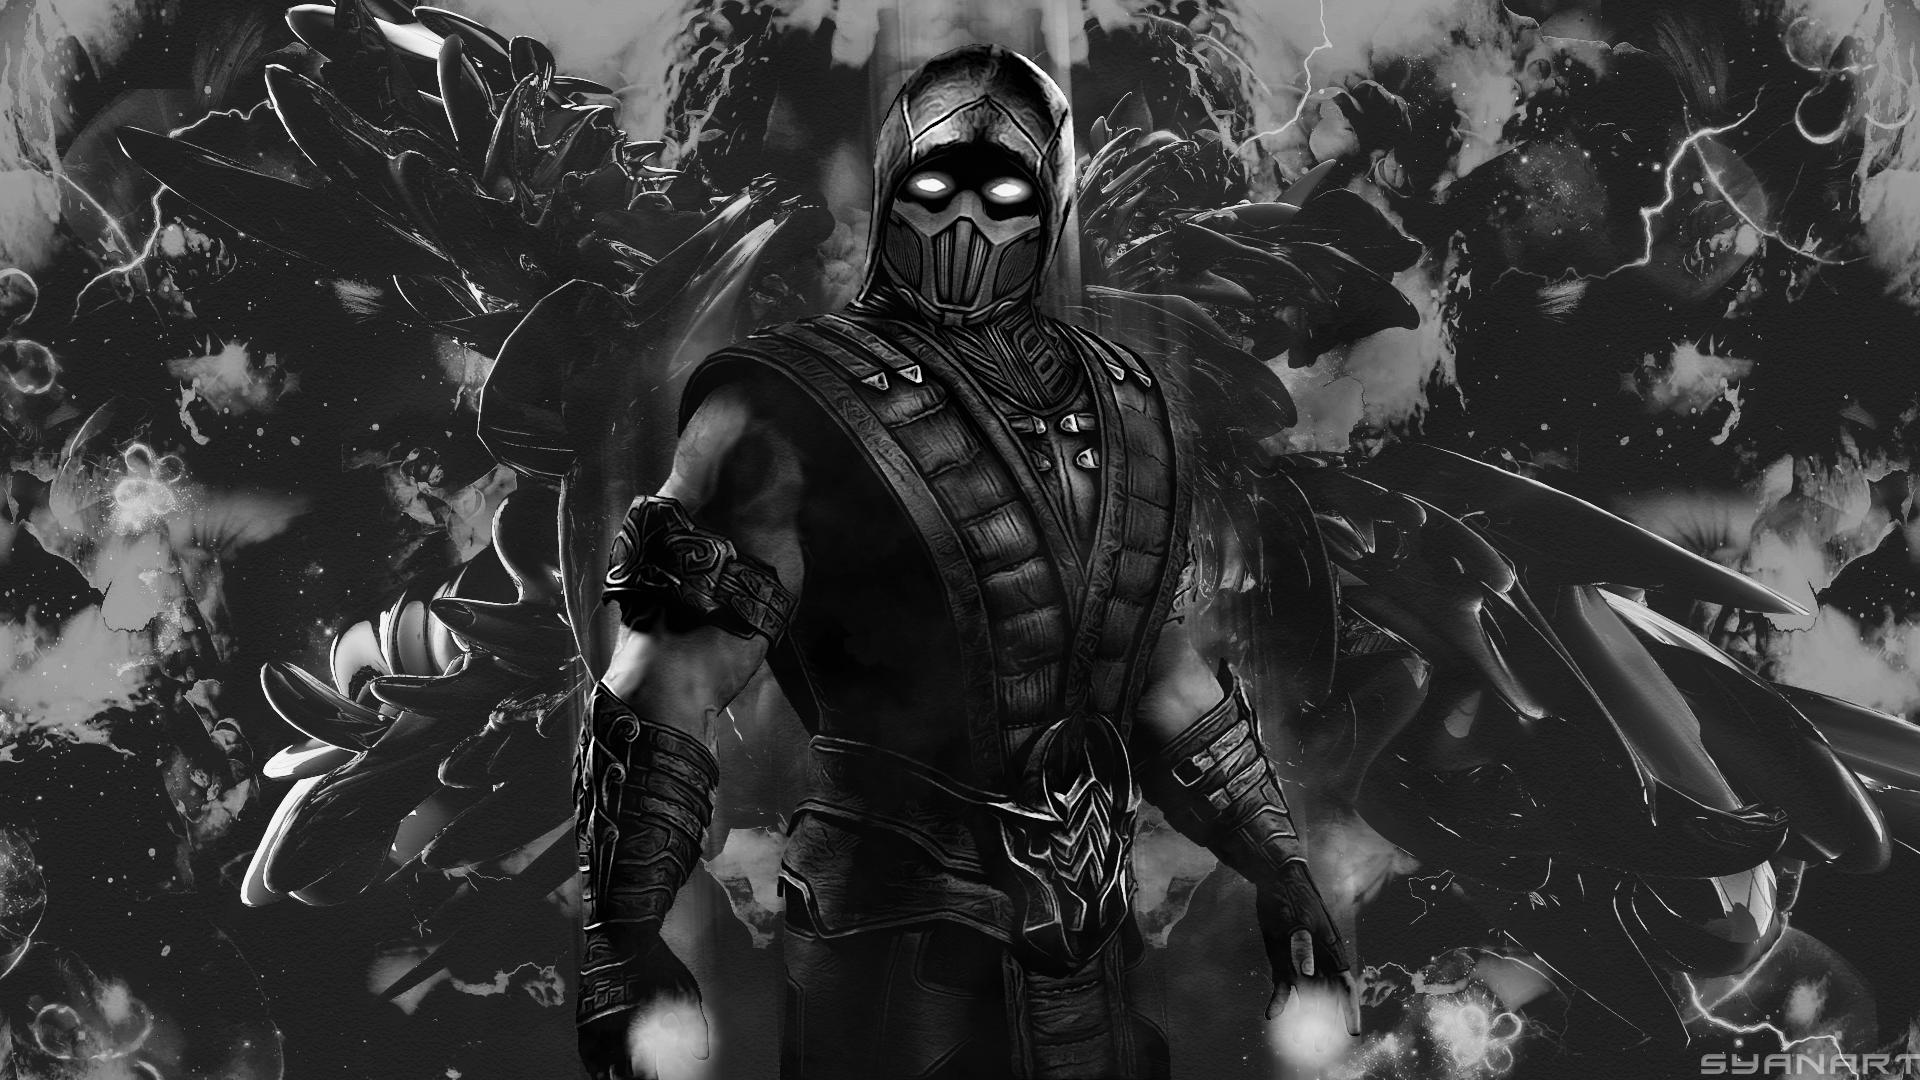 Mortal Kombat Noob Saibot wallpaper